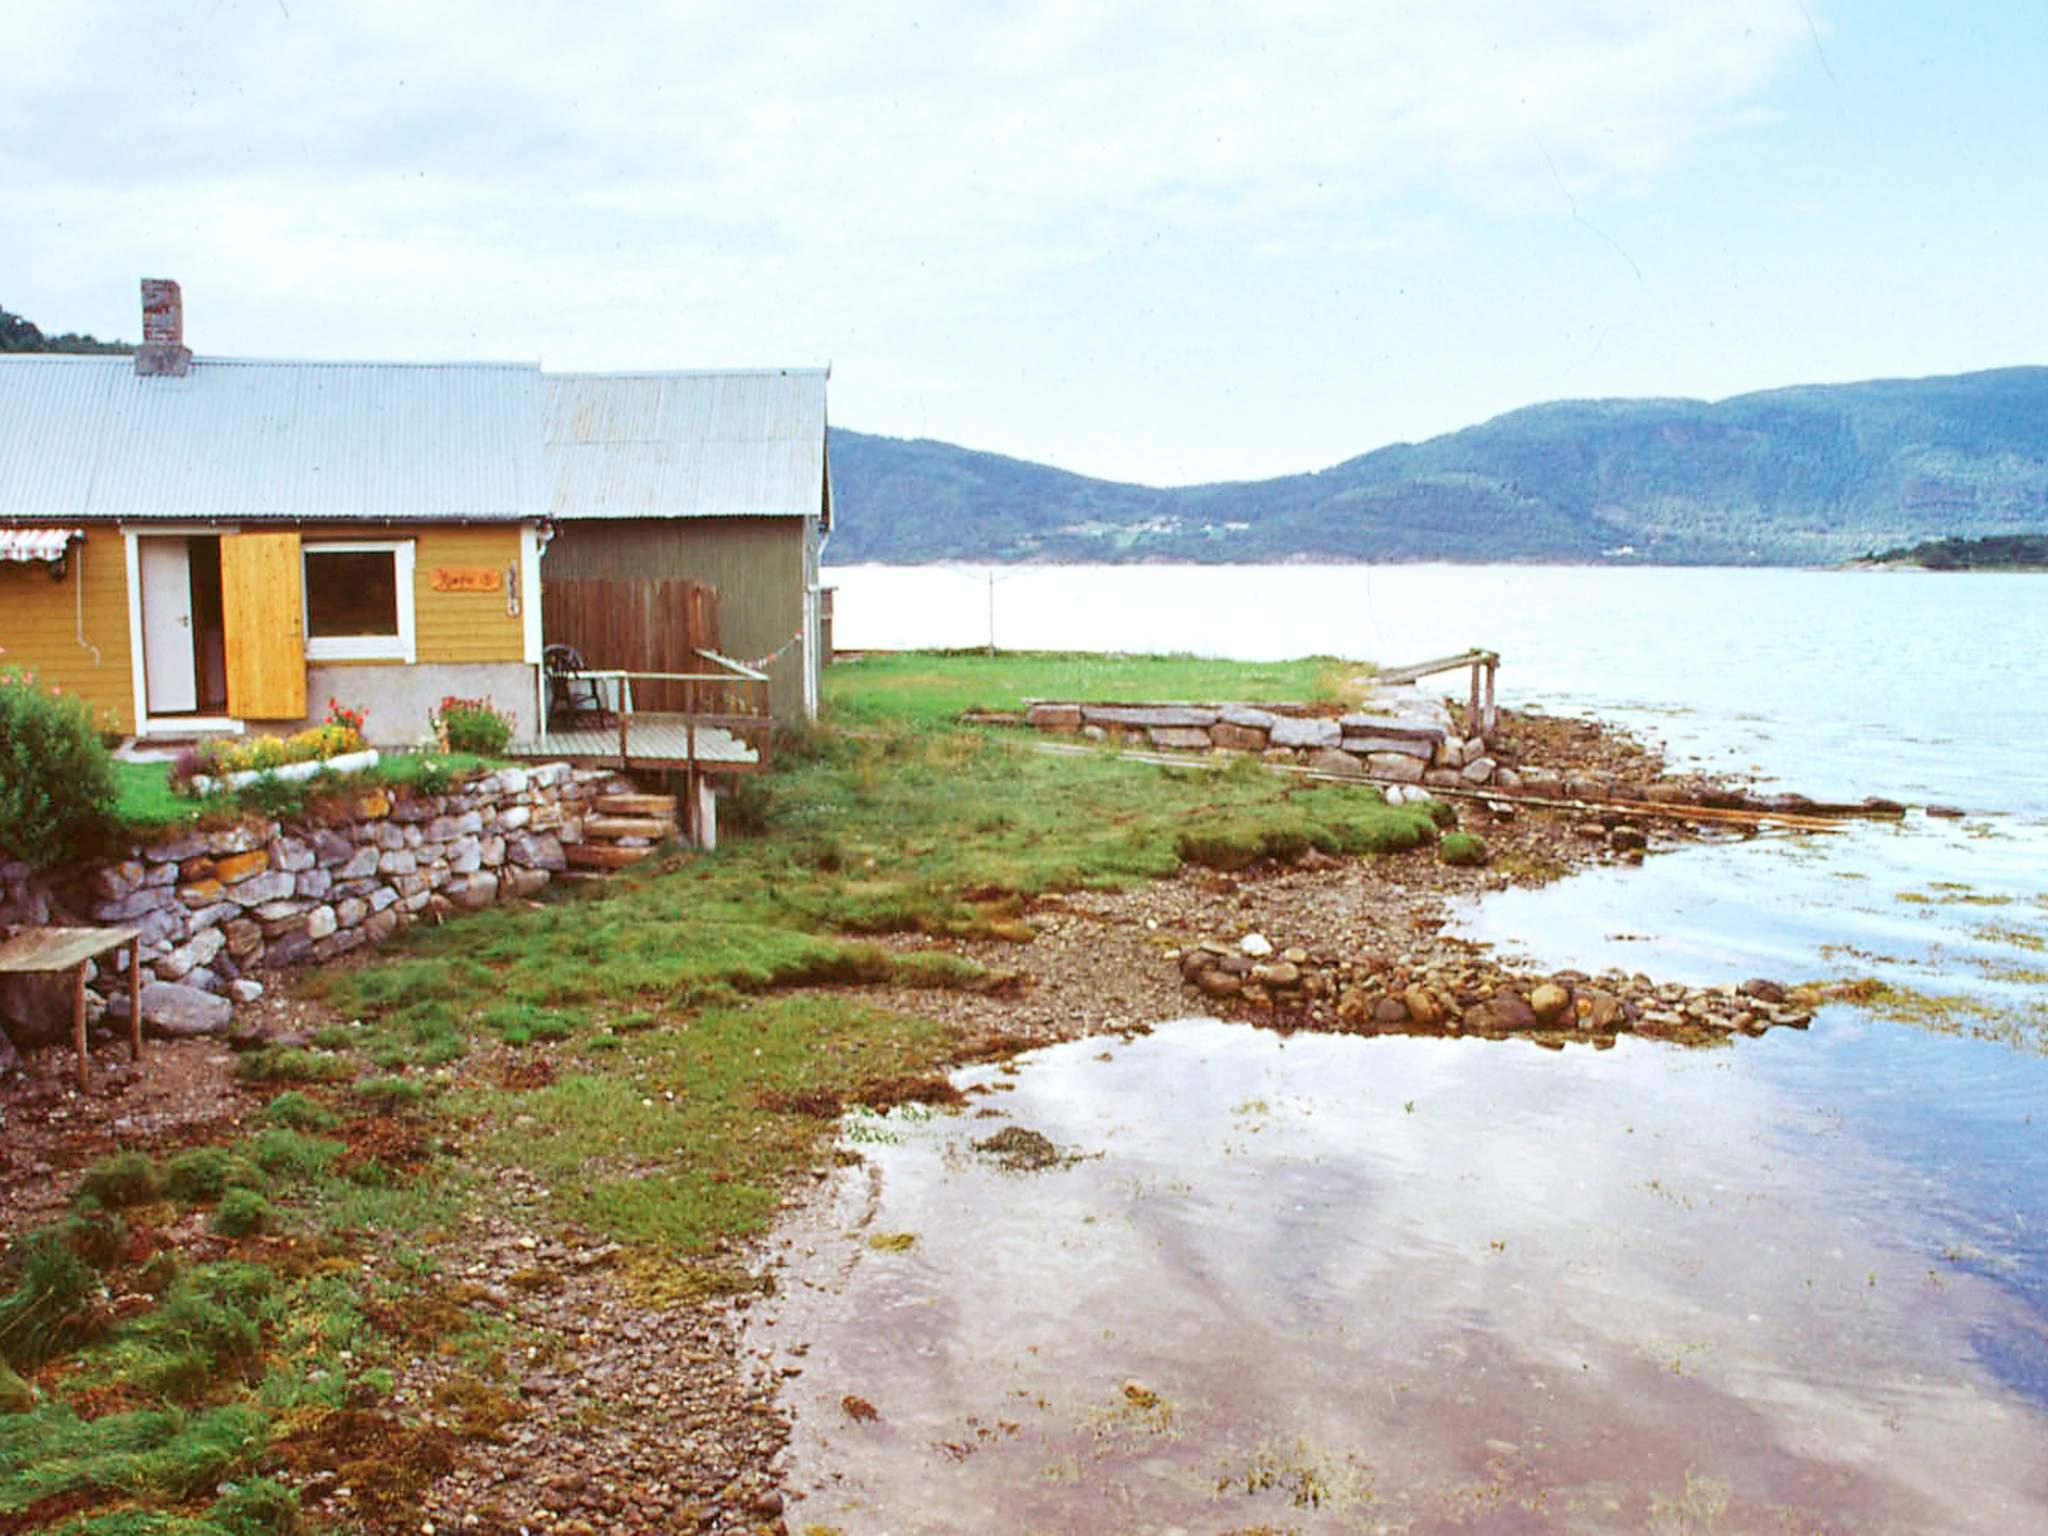 Ferienhaus Vistdal (85941), Vistdal, More - Romsdal, Westnorwegen, Norwegen, Bild 5